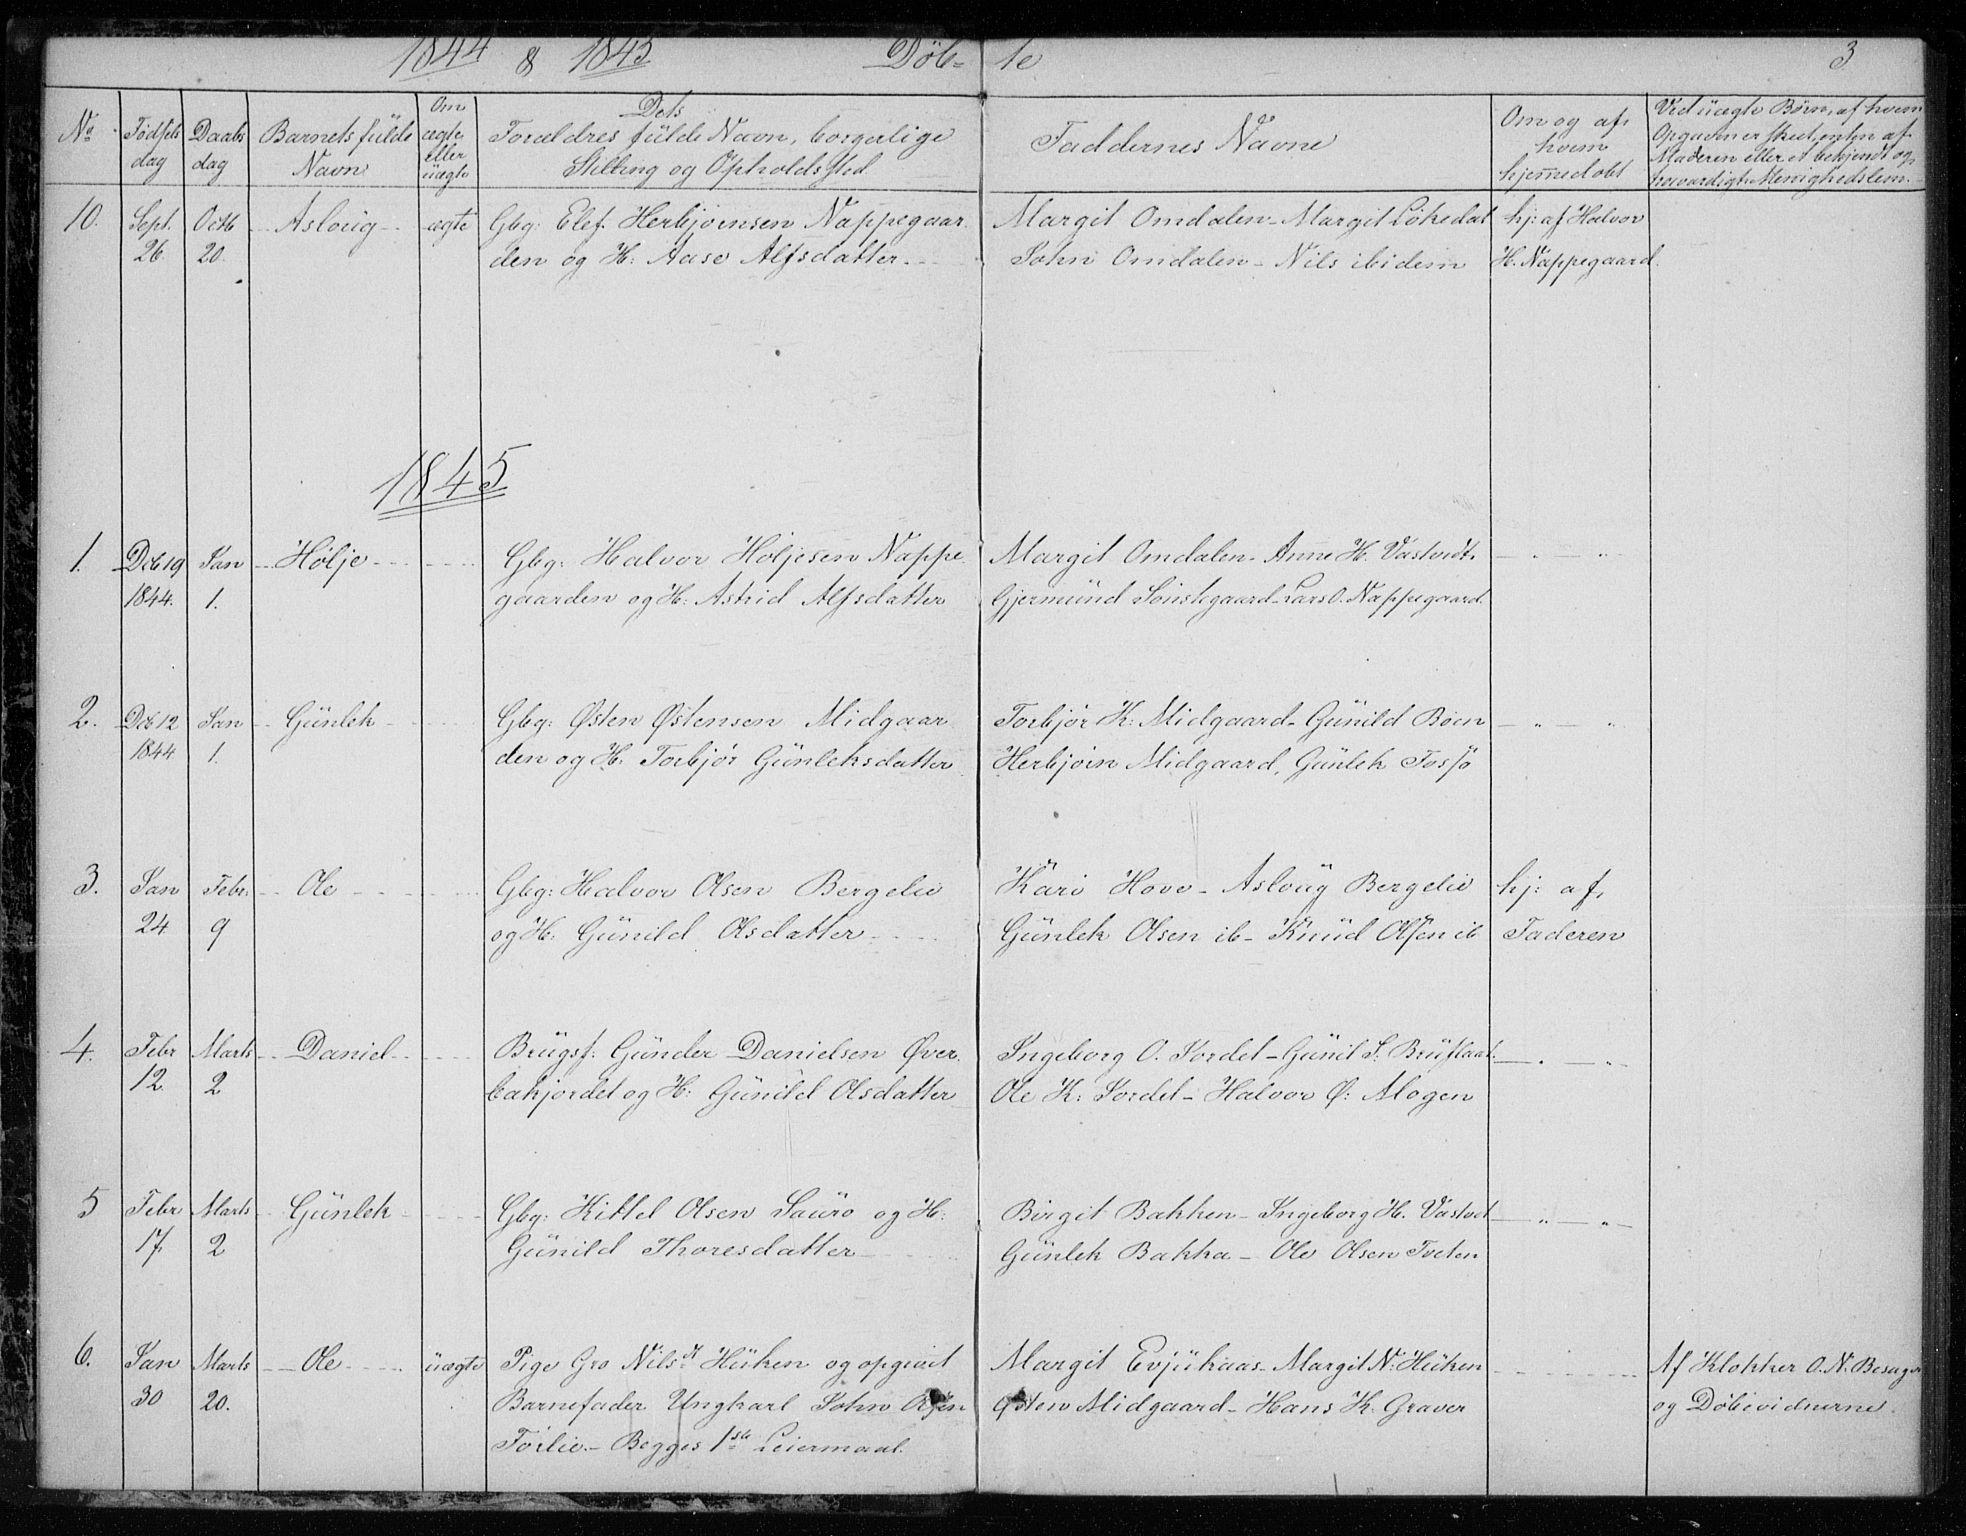 SAKO, Gransherad kirkebøker, F/Fb/L0003: Ministerialbok nr. II 3, 1844-1859, s. 3